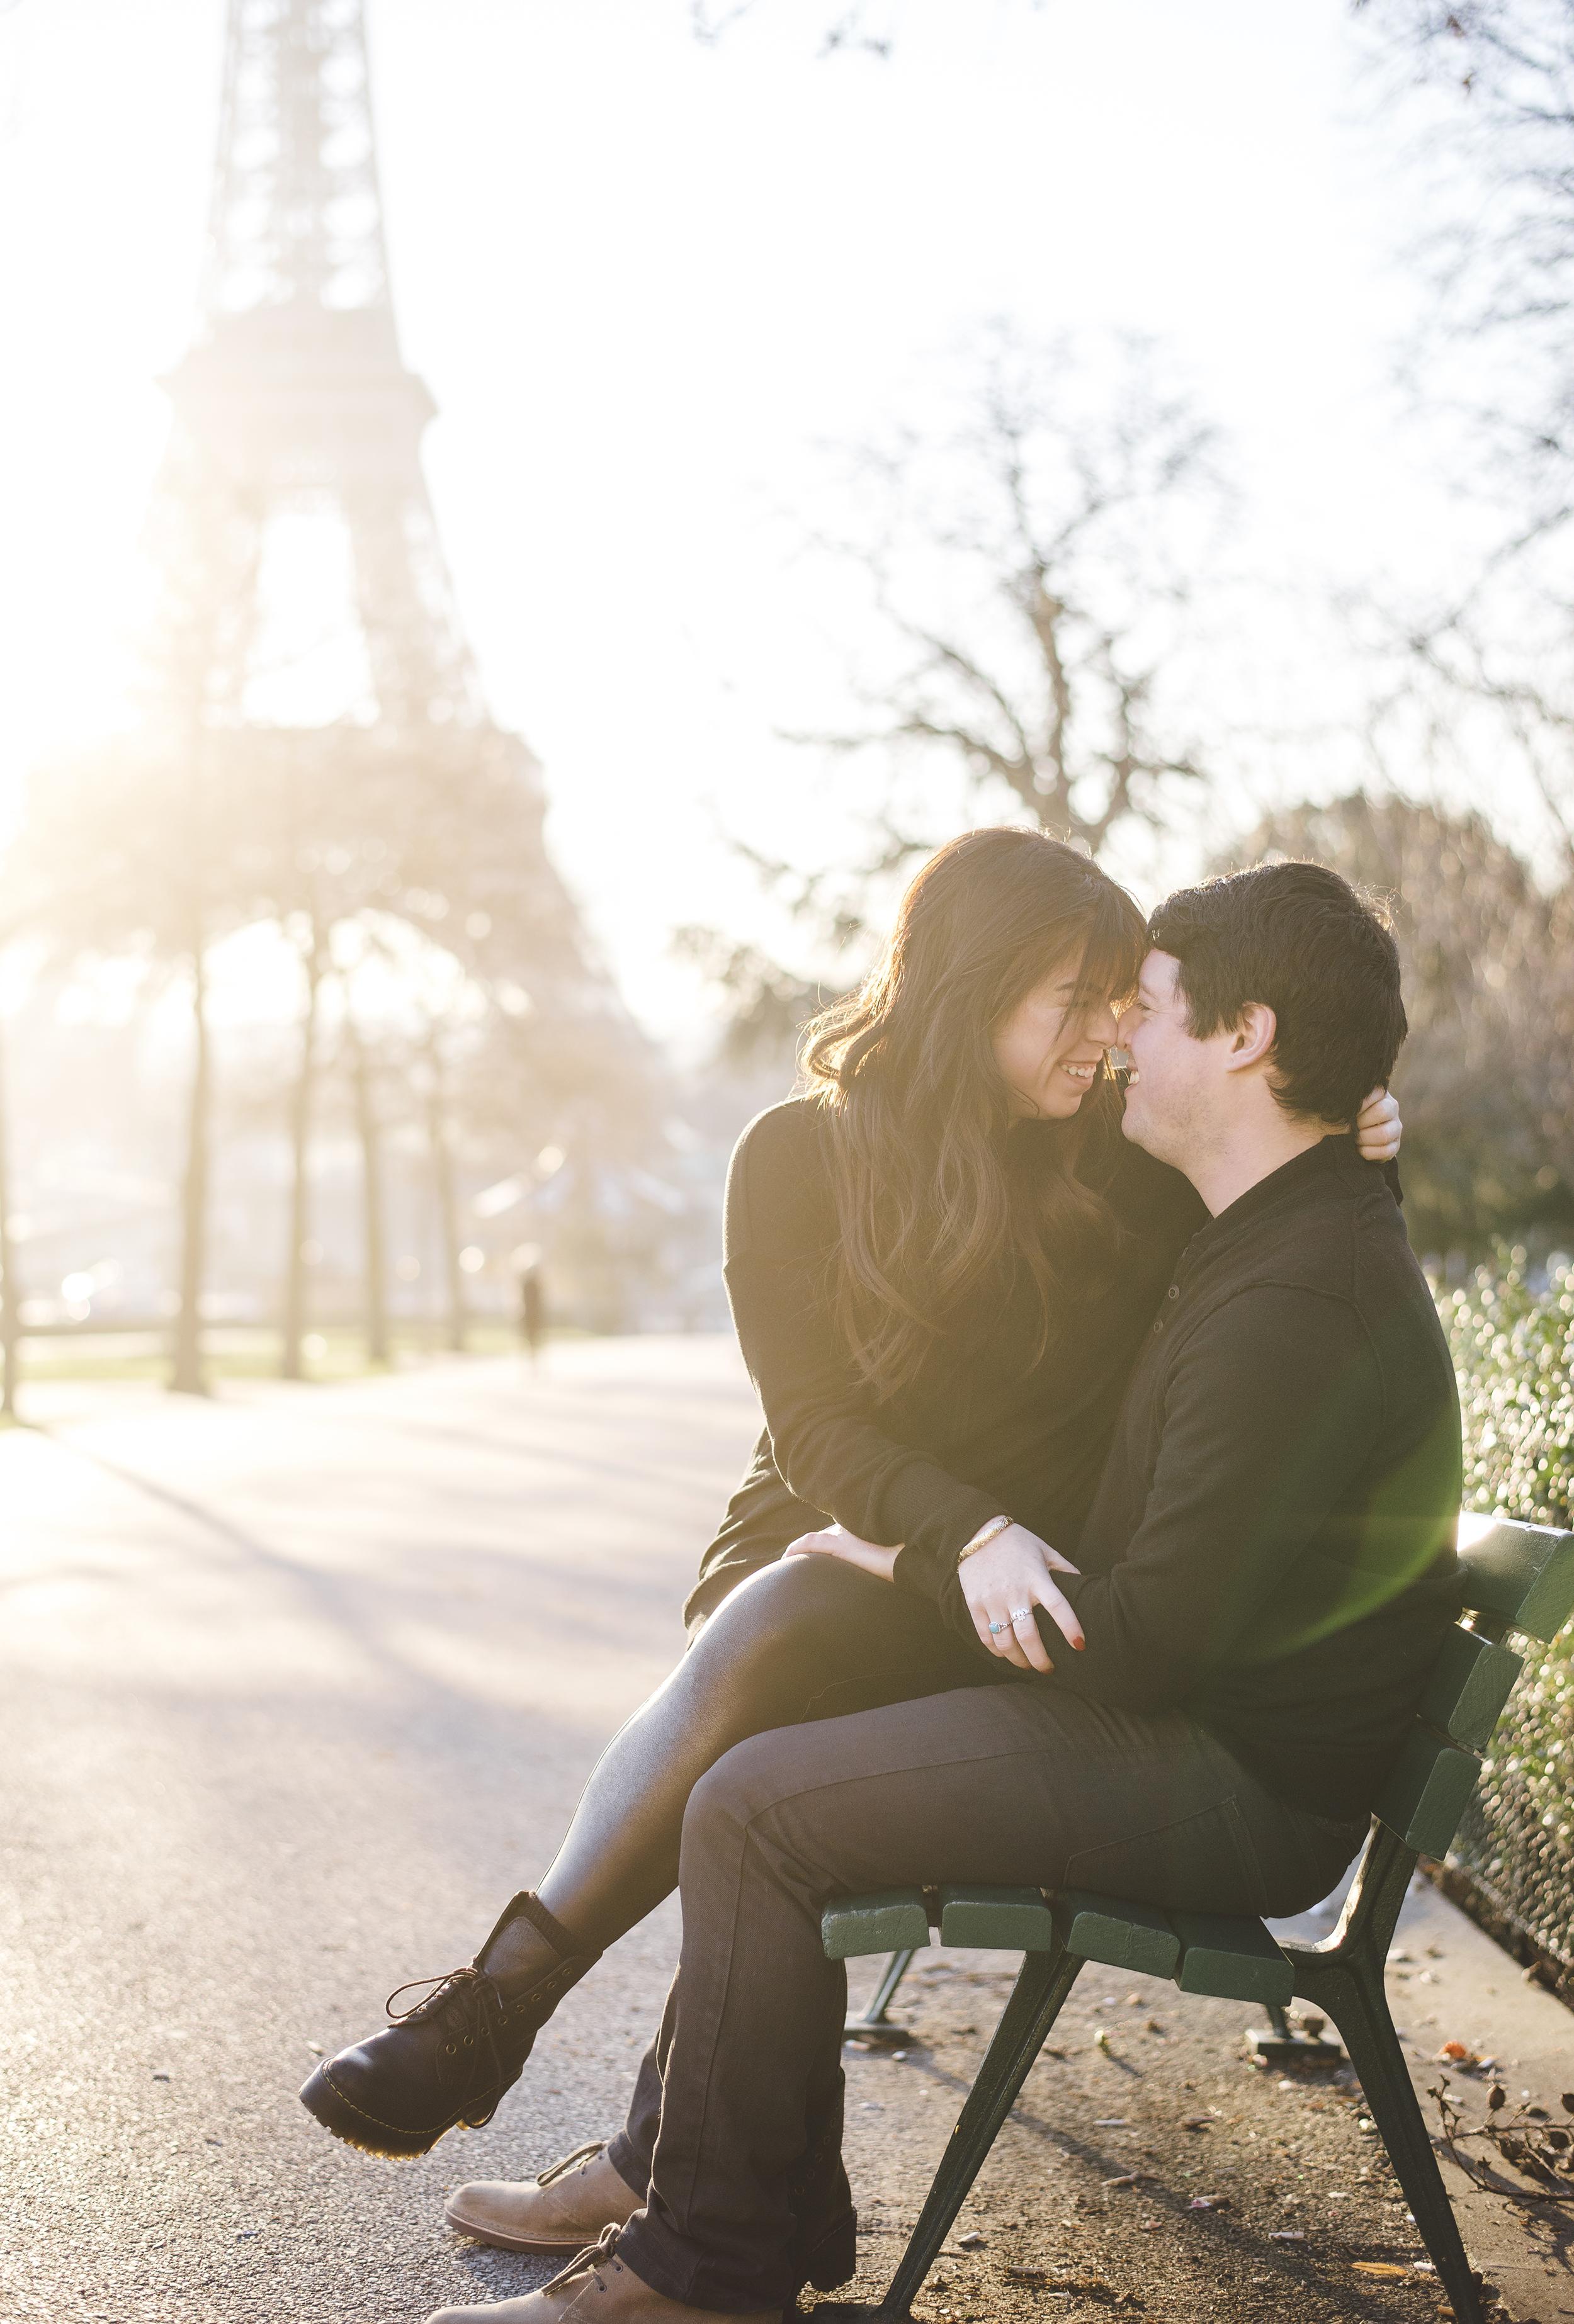 Anniversary-photoshoot-Paris-Trocadero-EiffelTower-Cafe-019.jpg